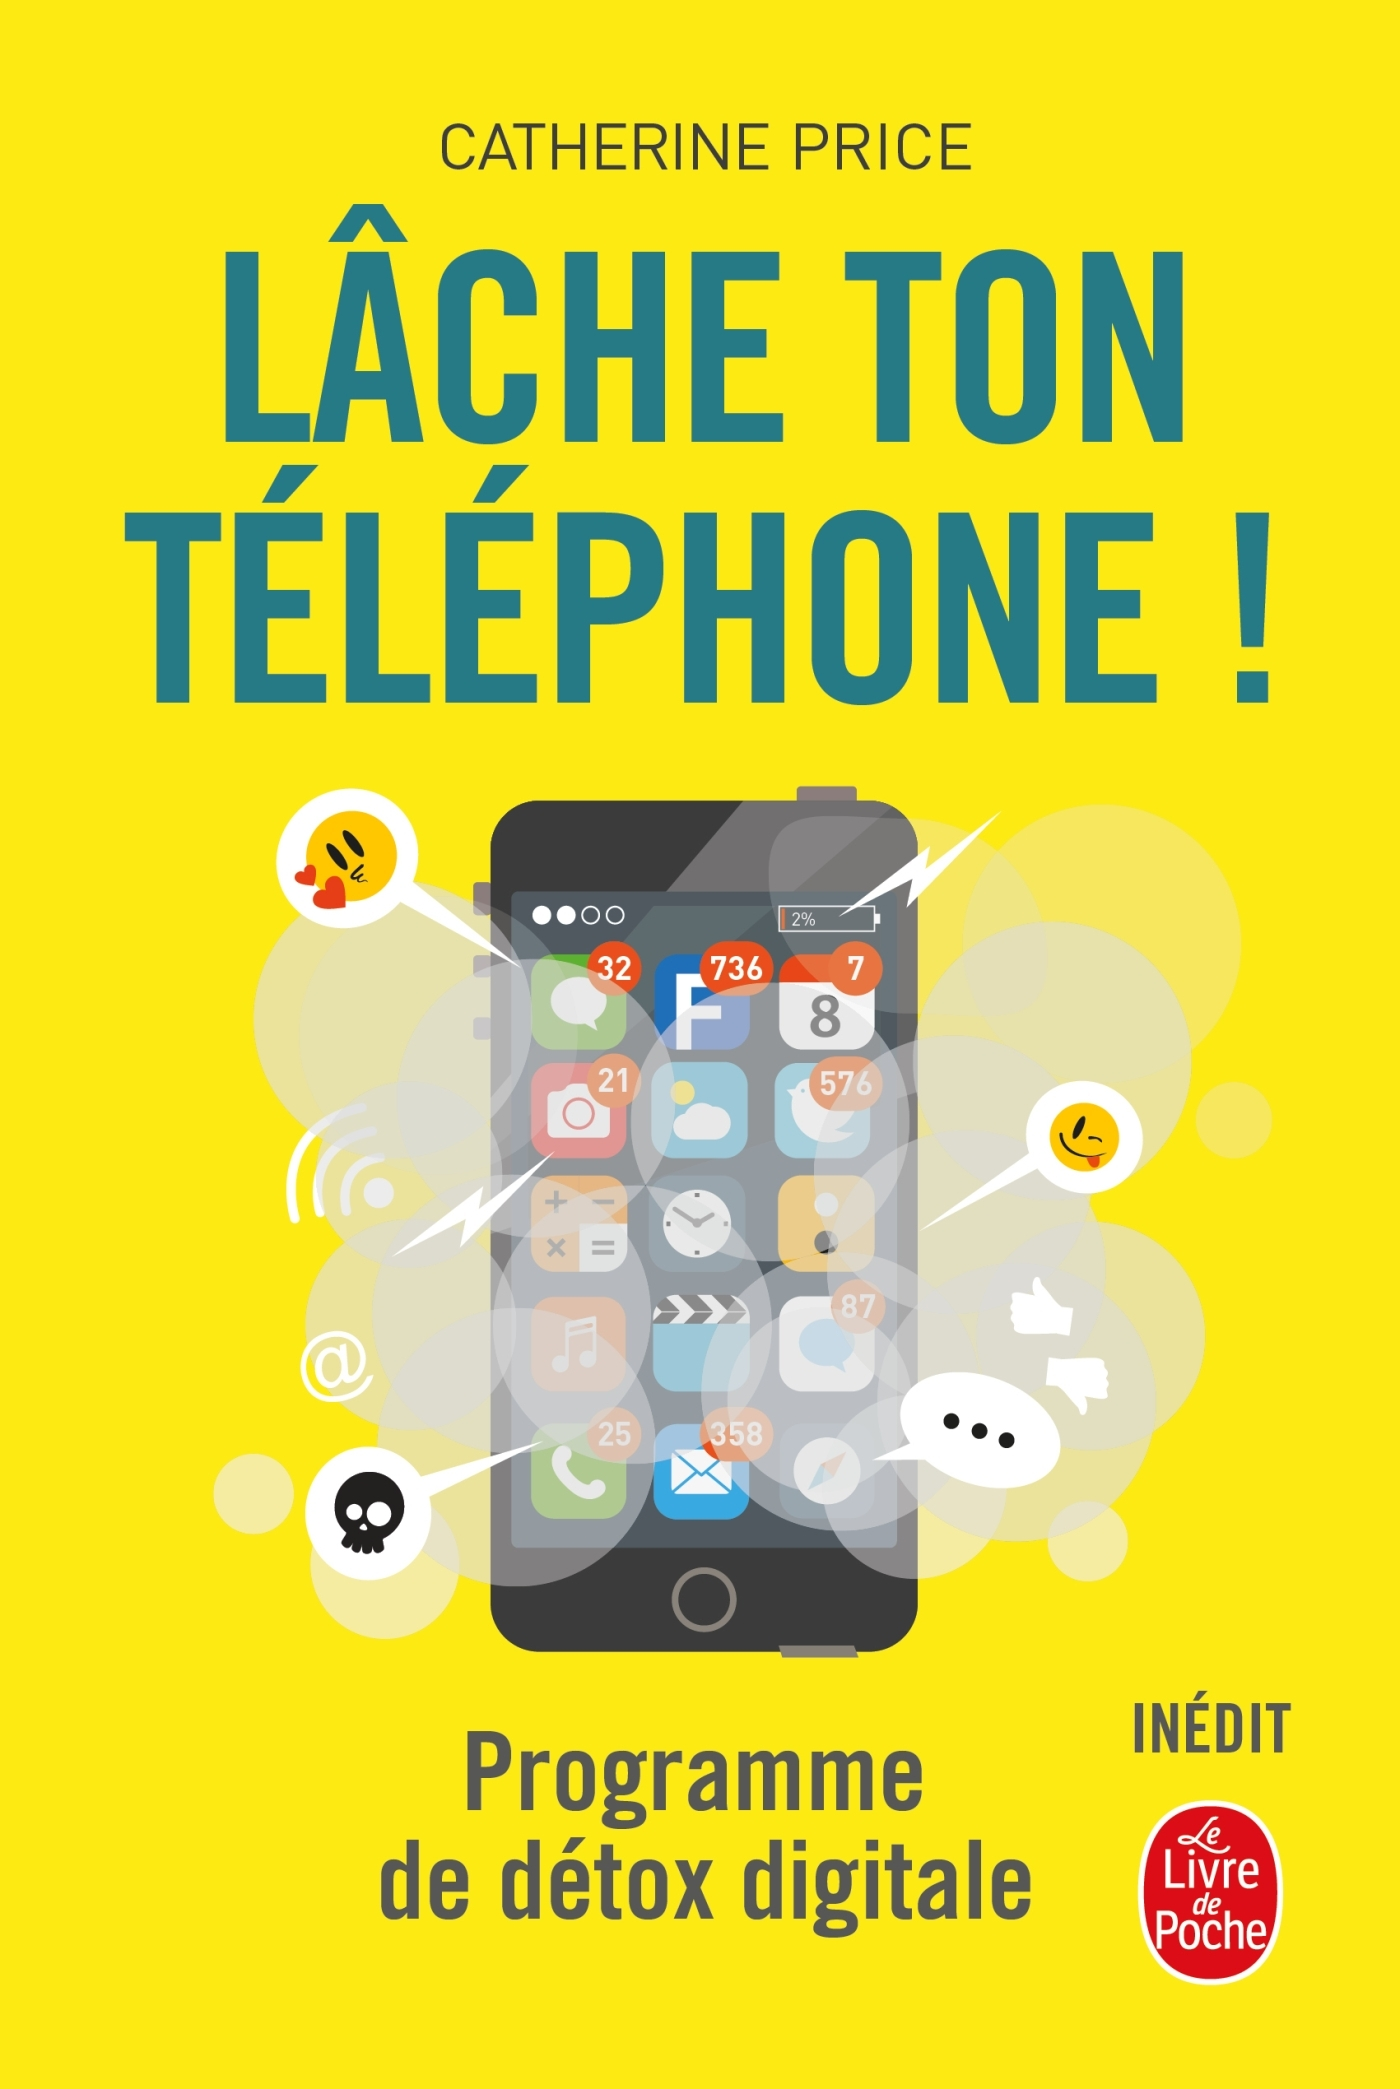 LACHE TON TELEPHONE !